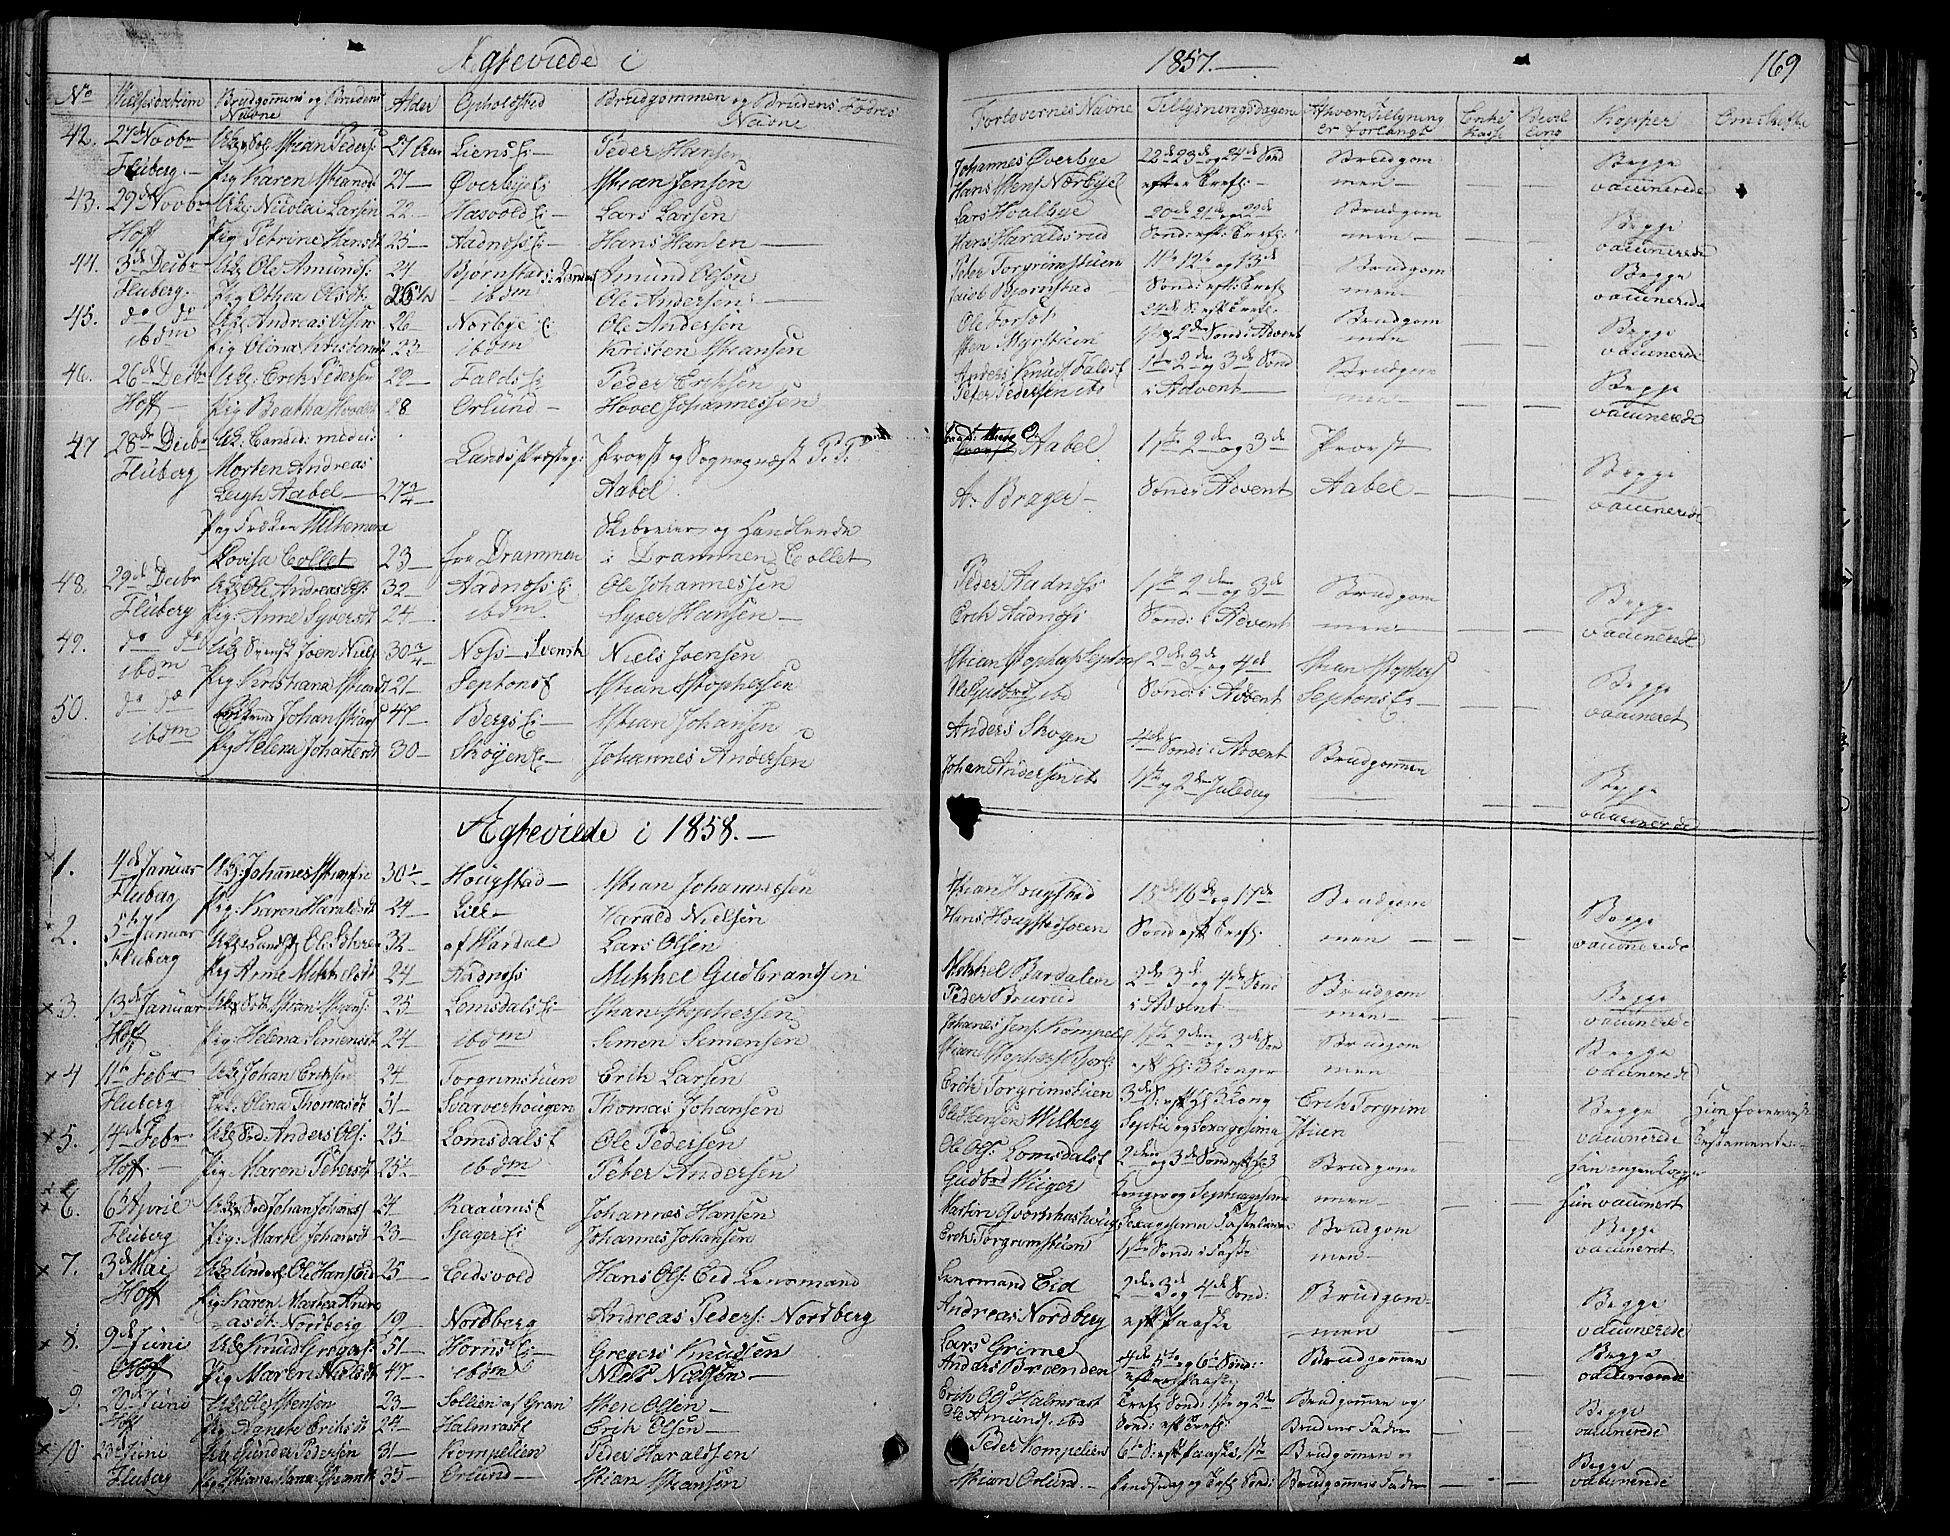 SAH, Søndre Land prestekontor, L/L0001: Klokkerbok nr. 1, 1849-1883, s. 169